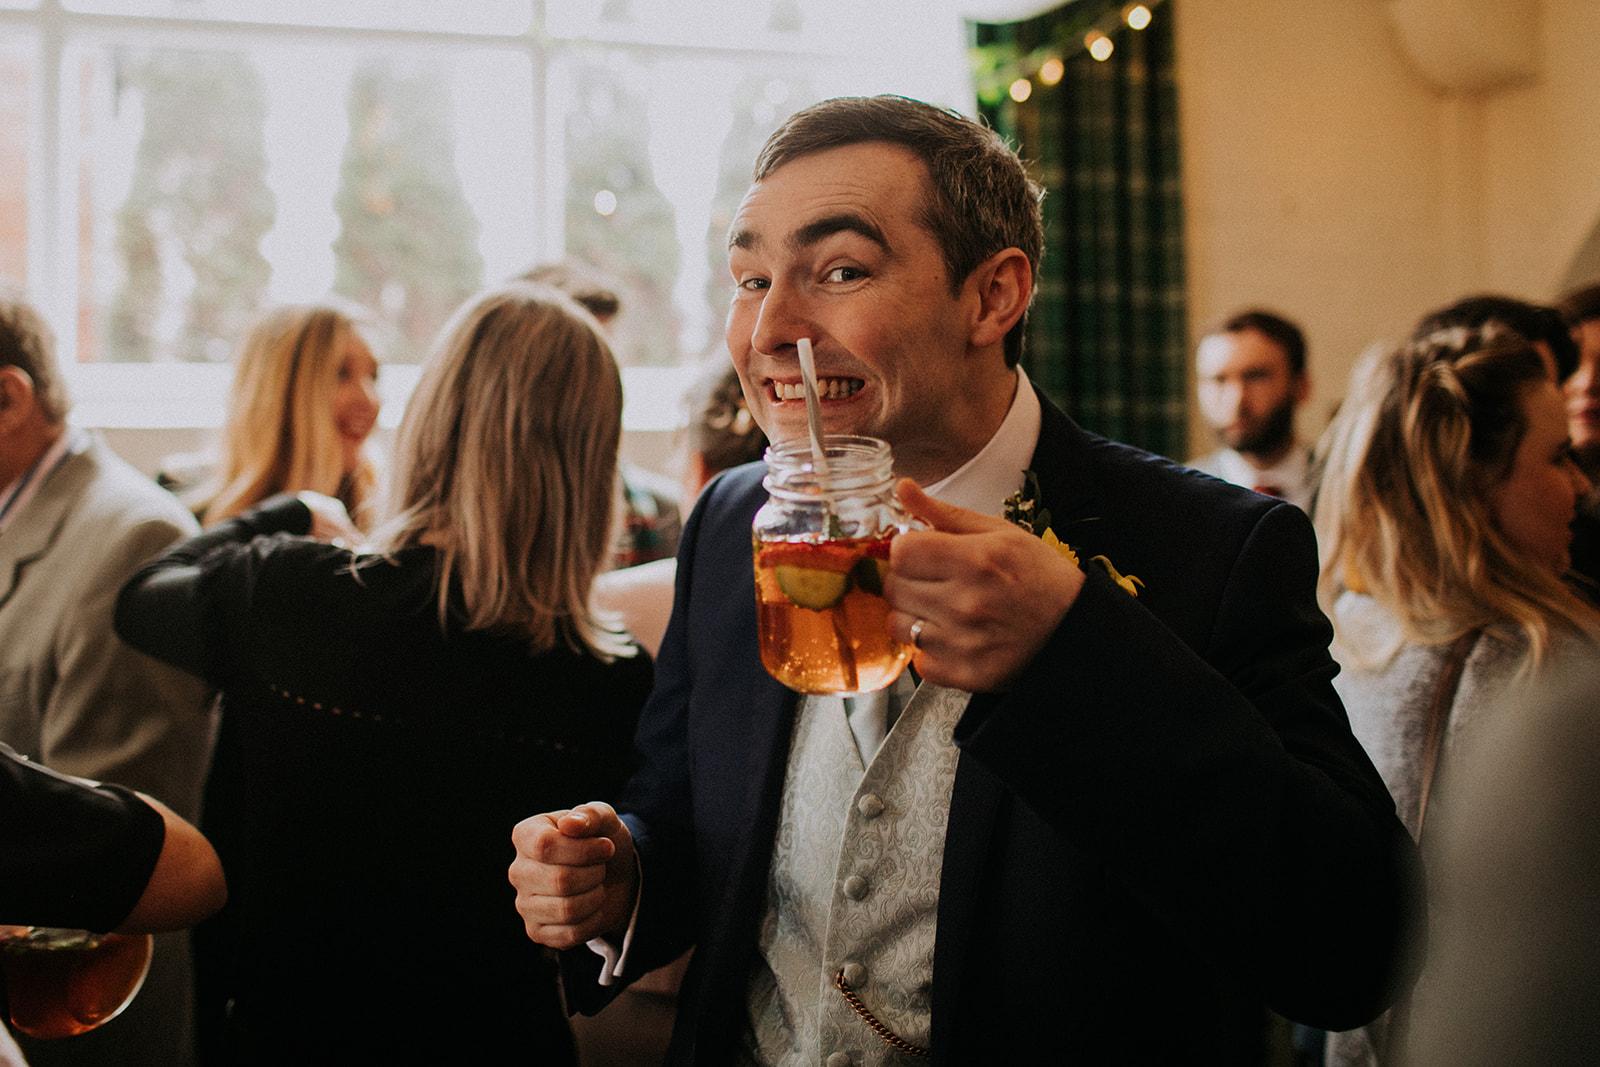 rutland wedding - fun wedding - east midlands wedding planner - Leicestershire wedding planning - nottingham wedding planning - groom drinking cocktail